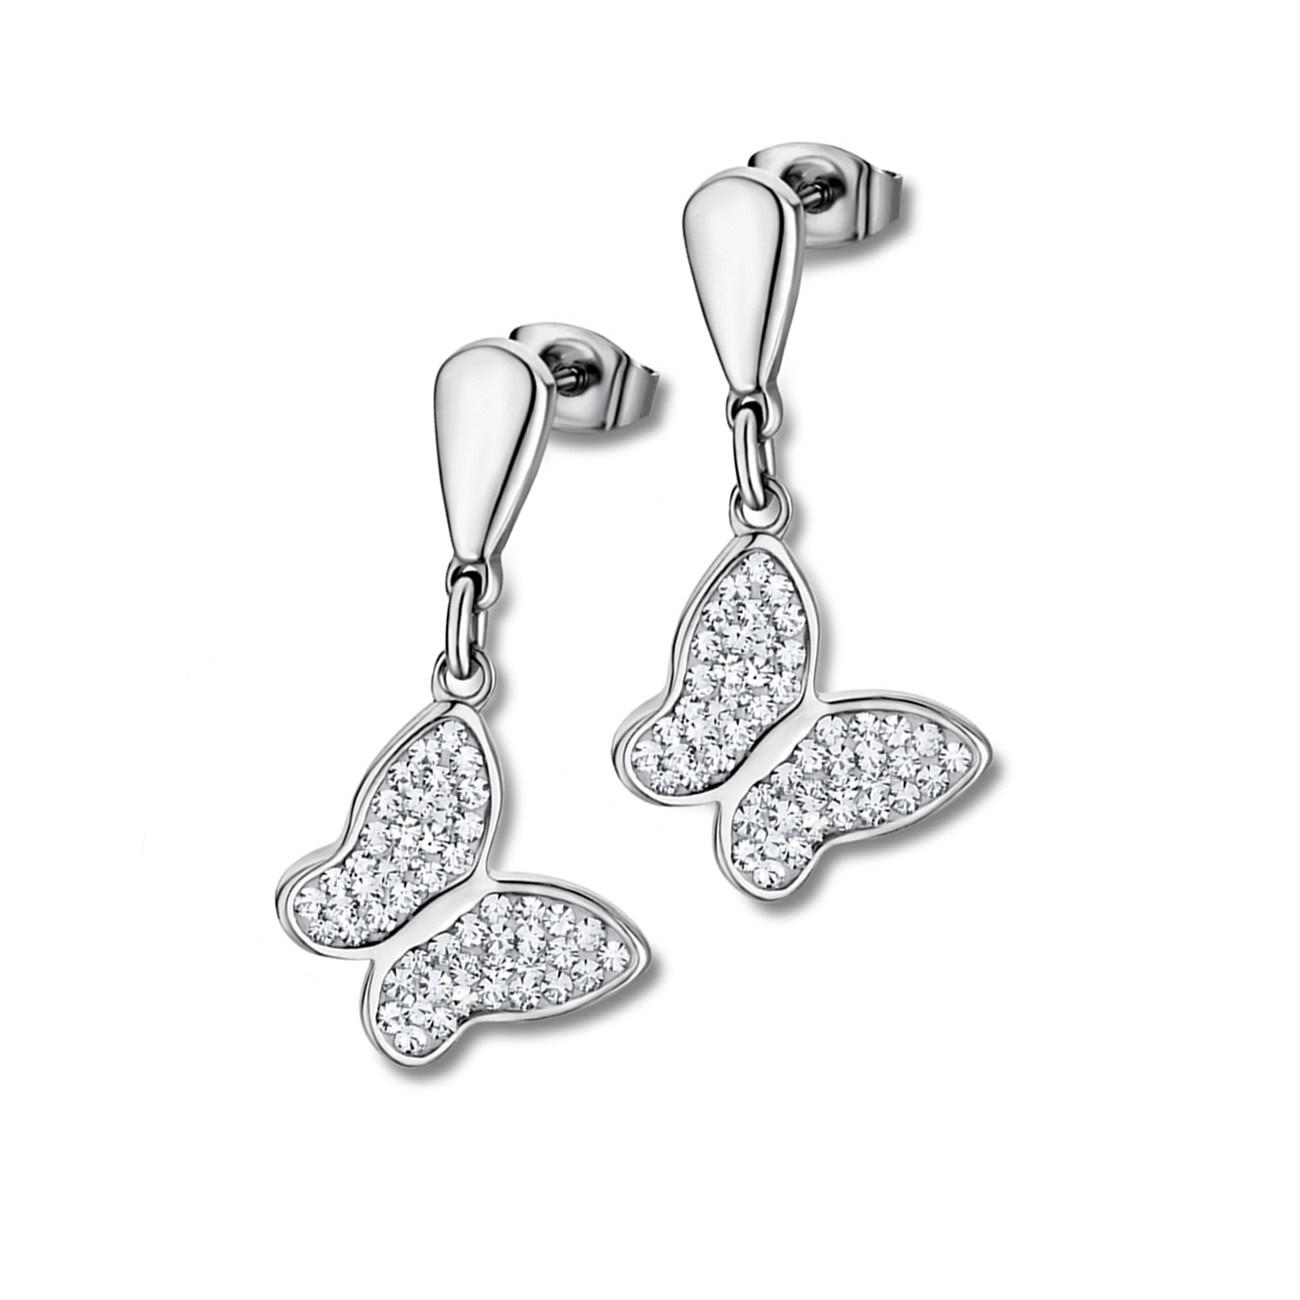 LOTUS Style Ohrringe Damen Edelstahl silber LS1782-4/1 Ohrstecker JLS1782-4-1